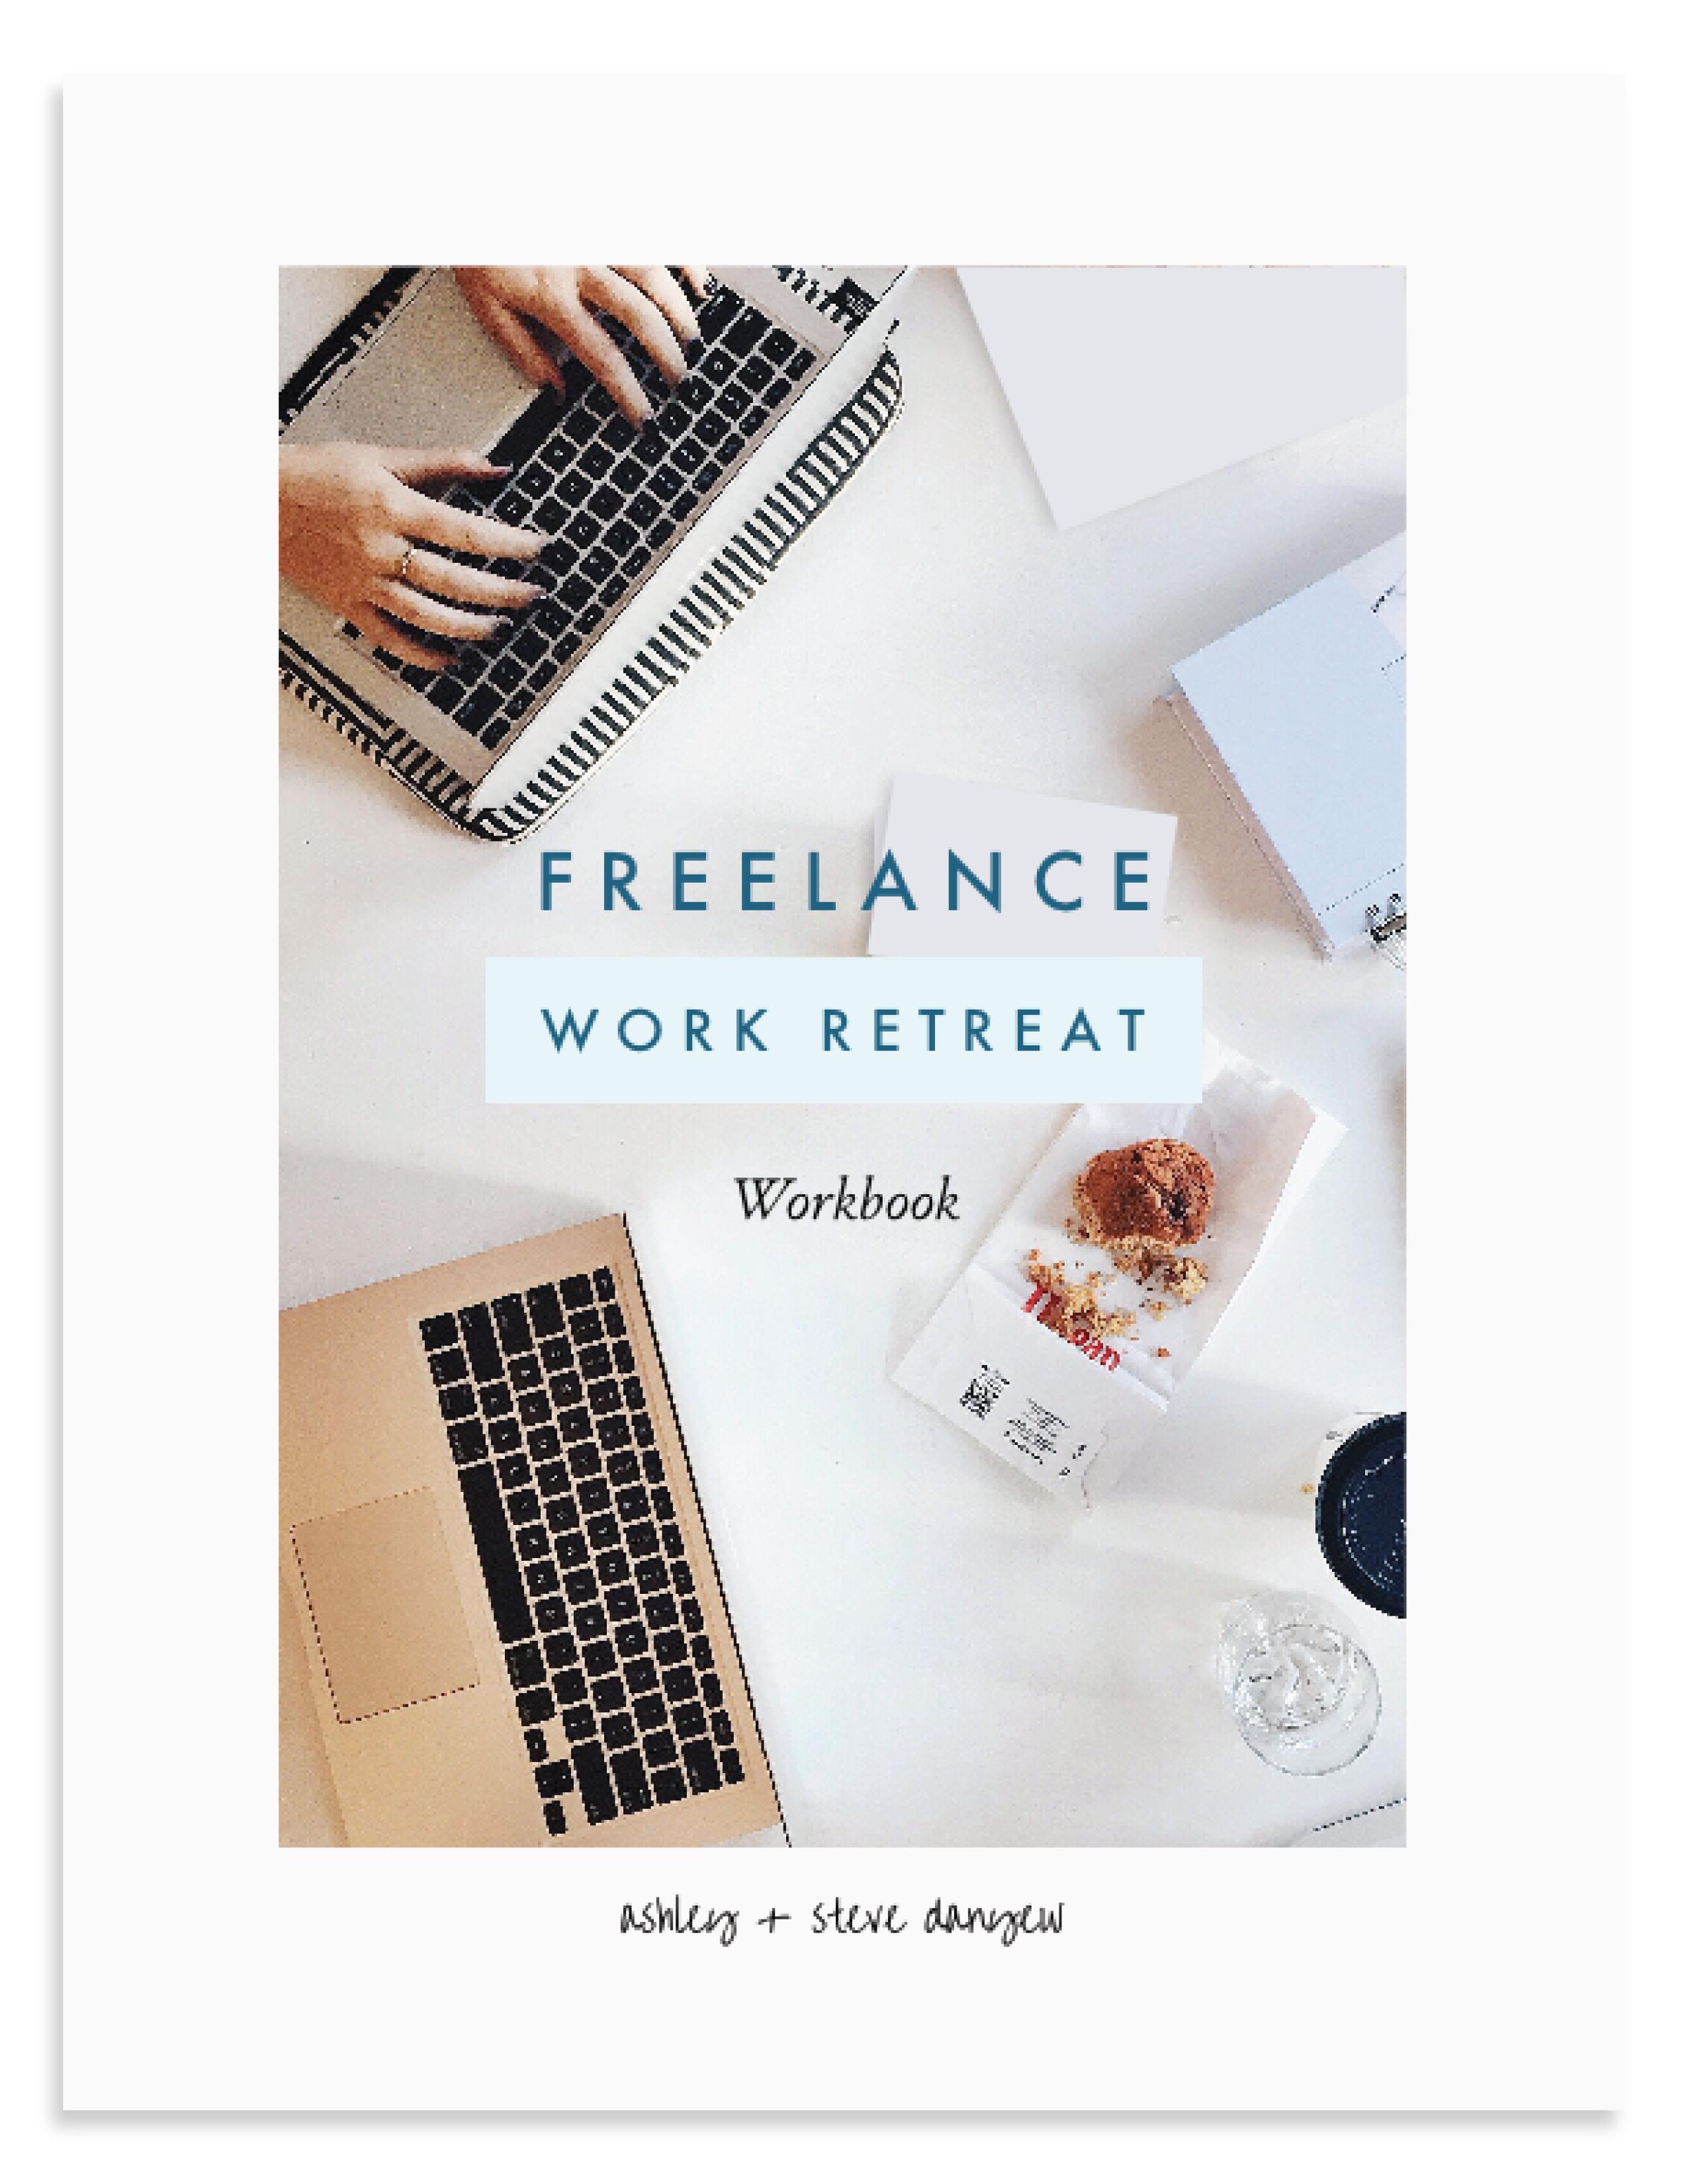 Work Retreat Workbook - Ashley & Steve Danyew.png